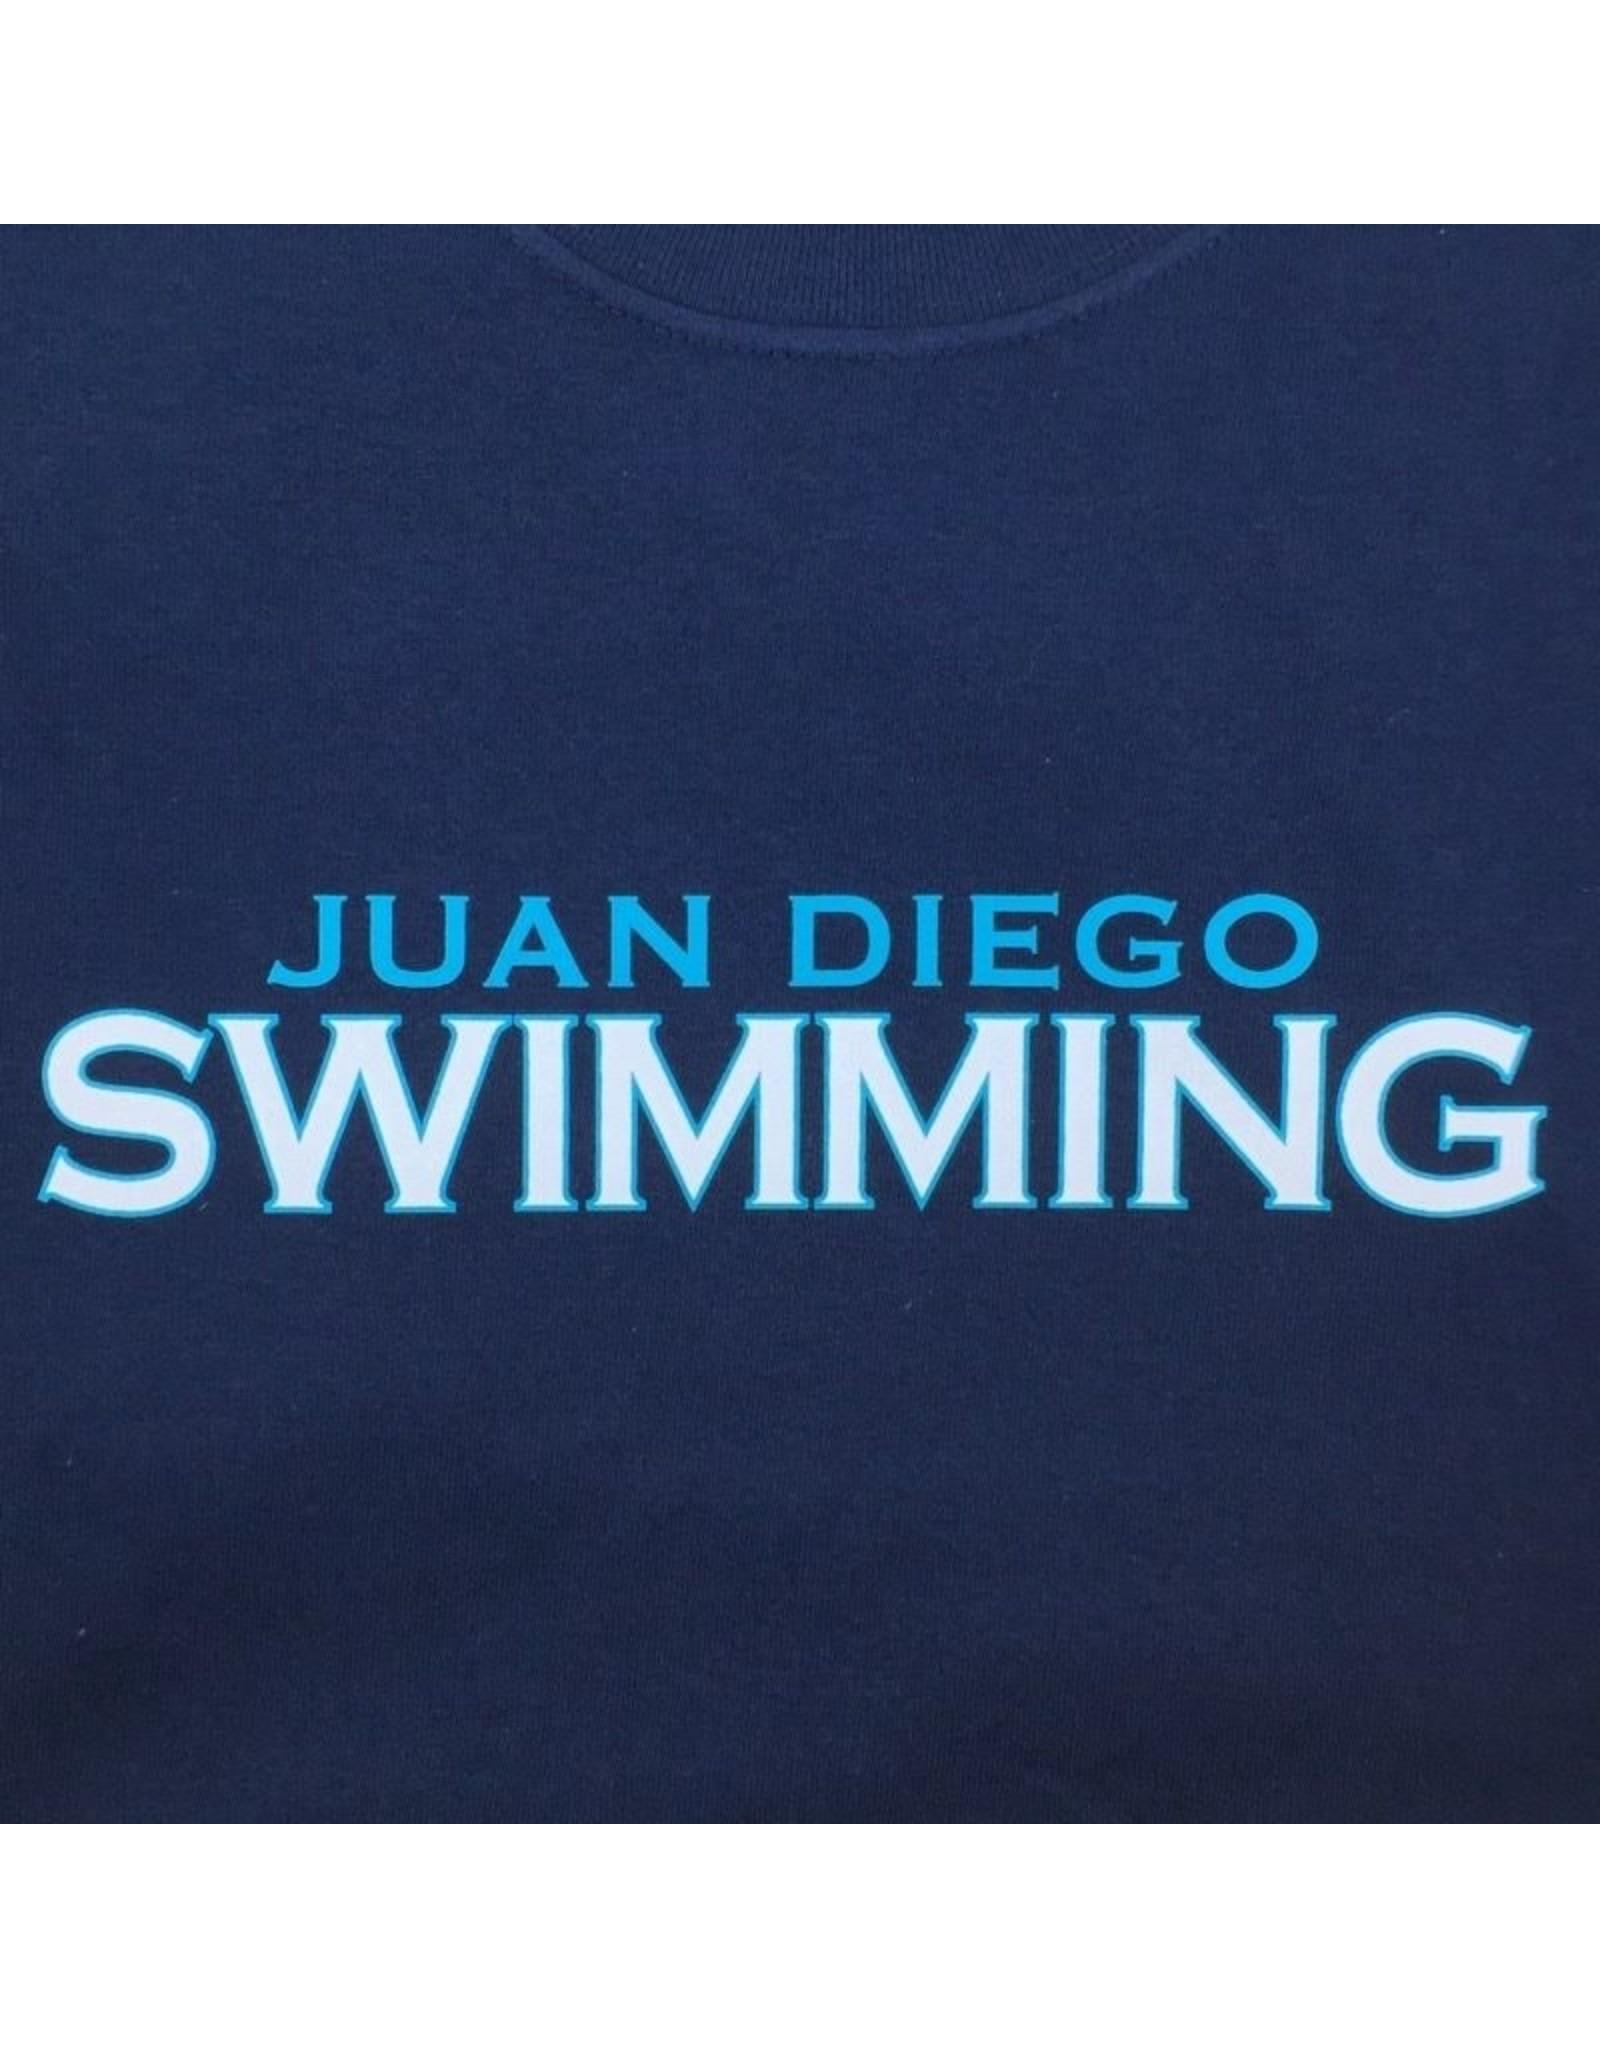 NON-UNIFORM Swimming, Juan Diego Swimming Custom Order Navy Unisex s/s t-shirt